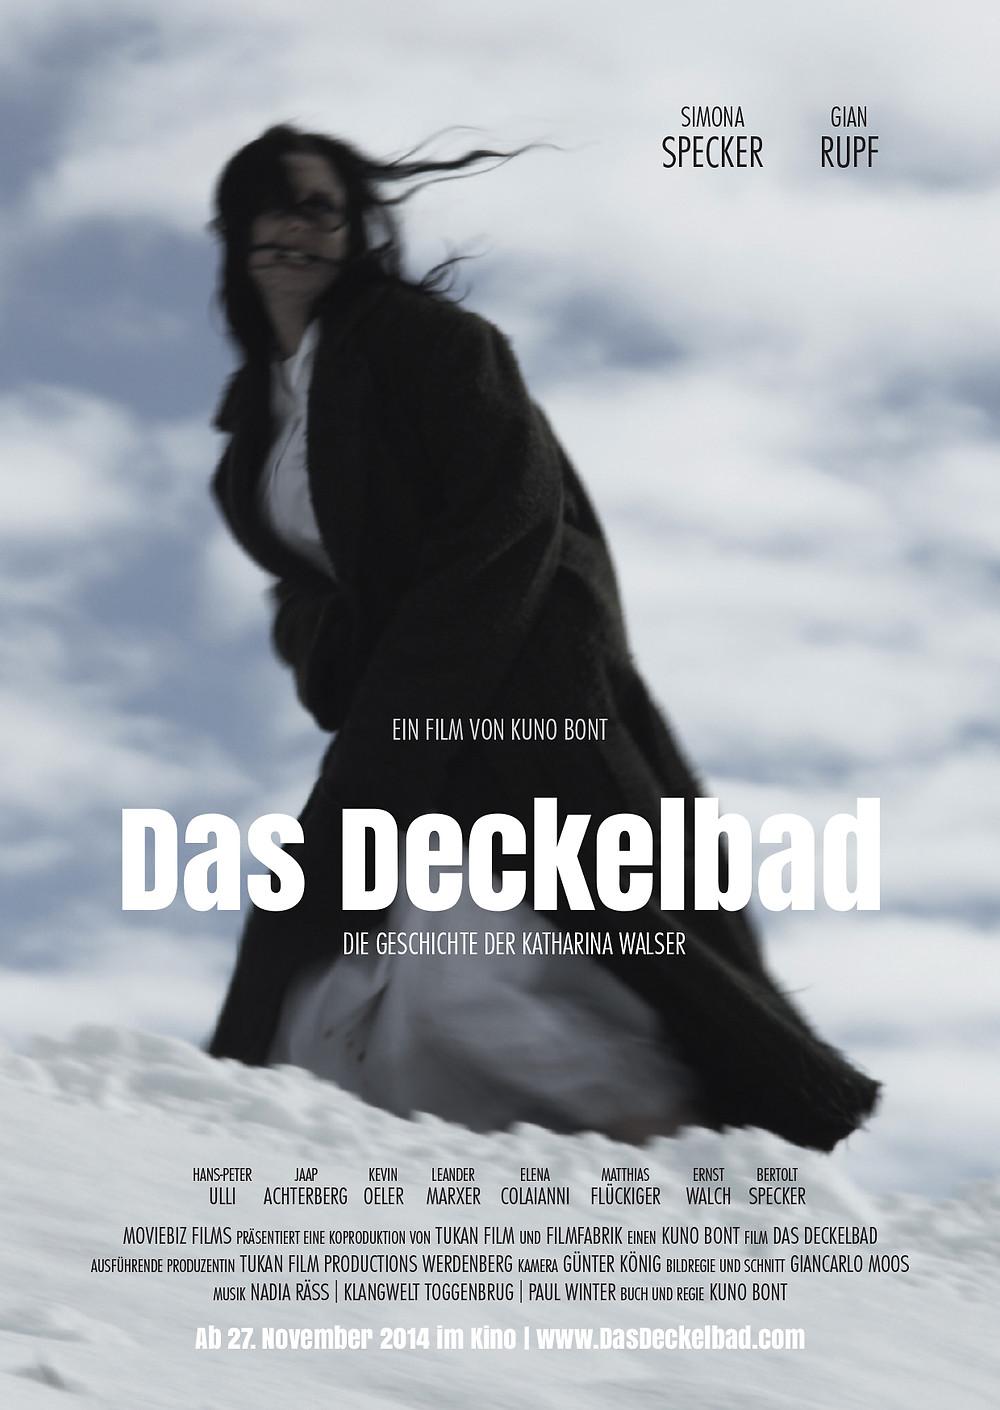 Postkarte Deckelbad A6-1.jpg